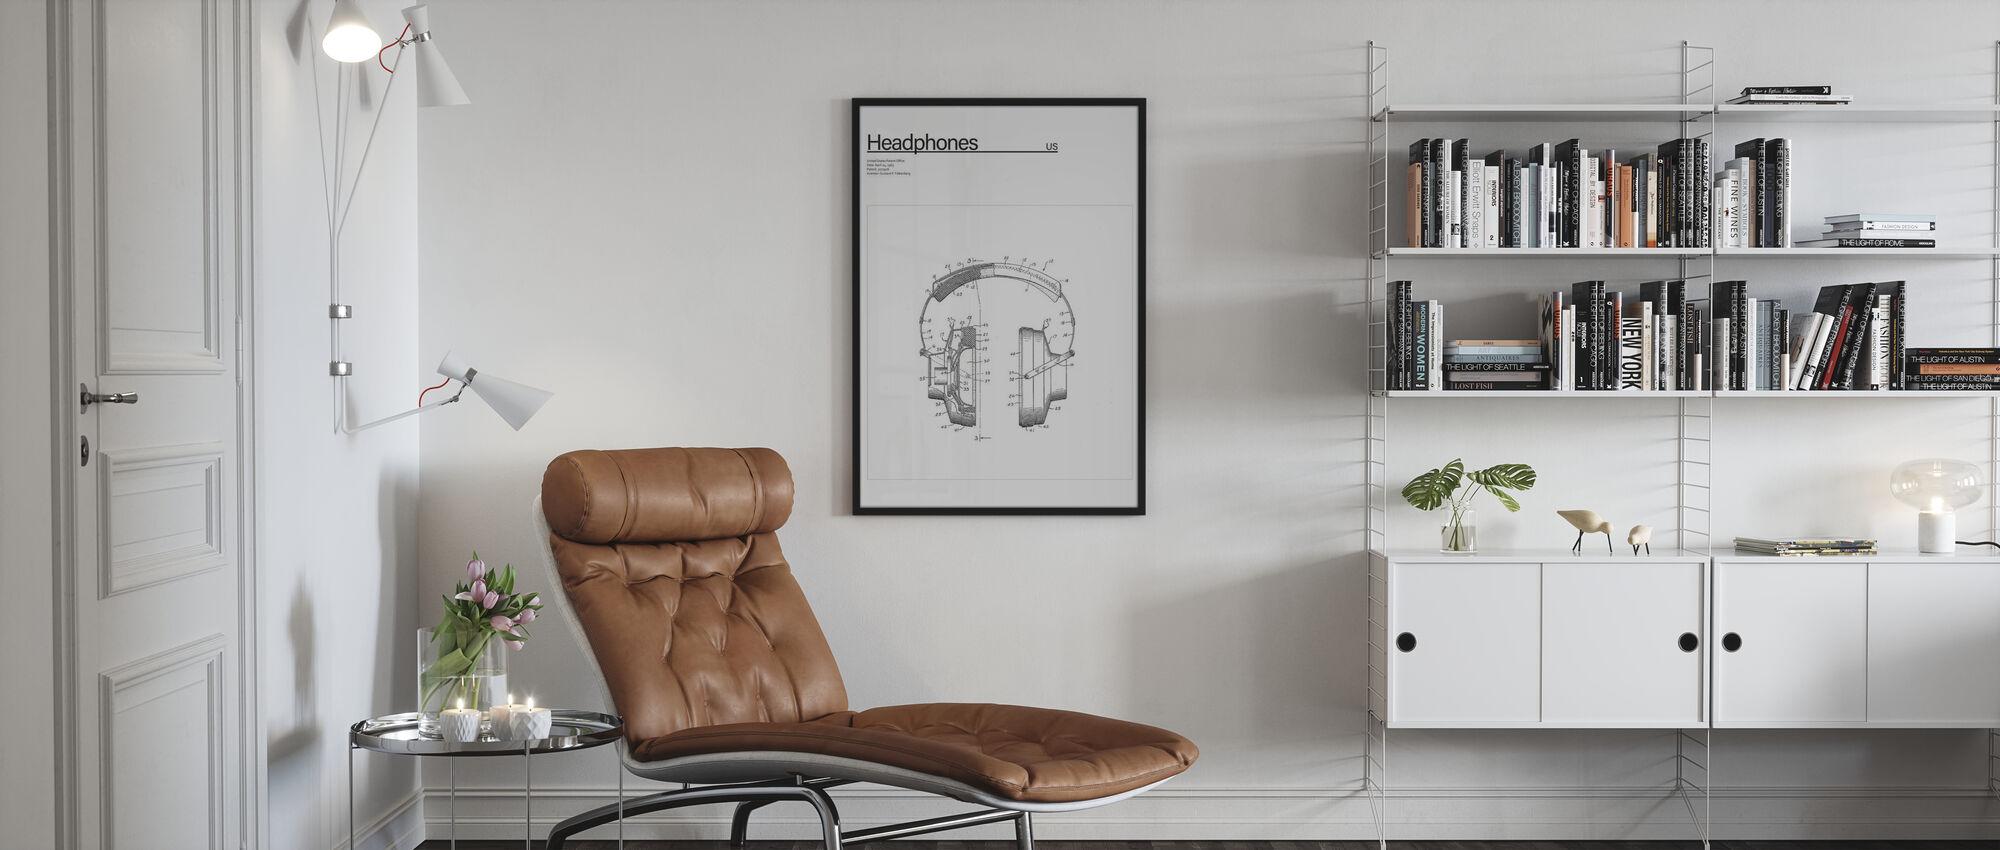 Patent Headpones - Poster - Woonkamer